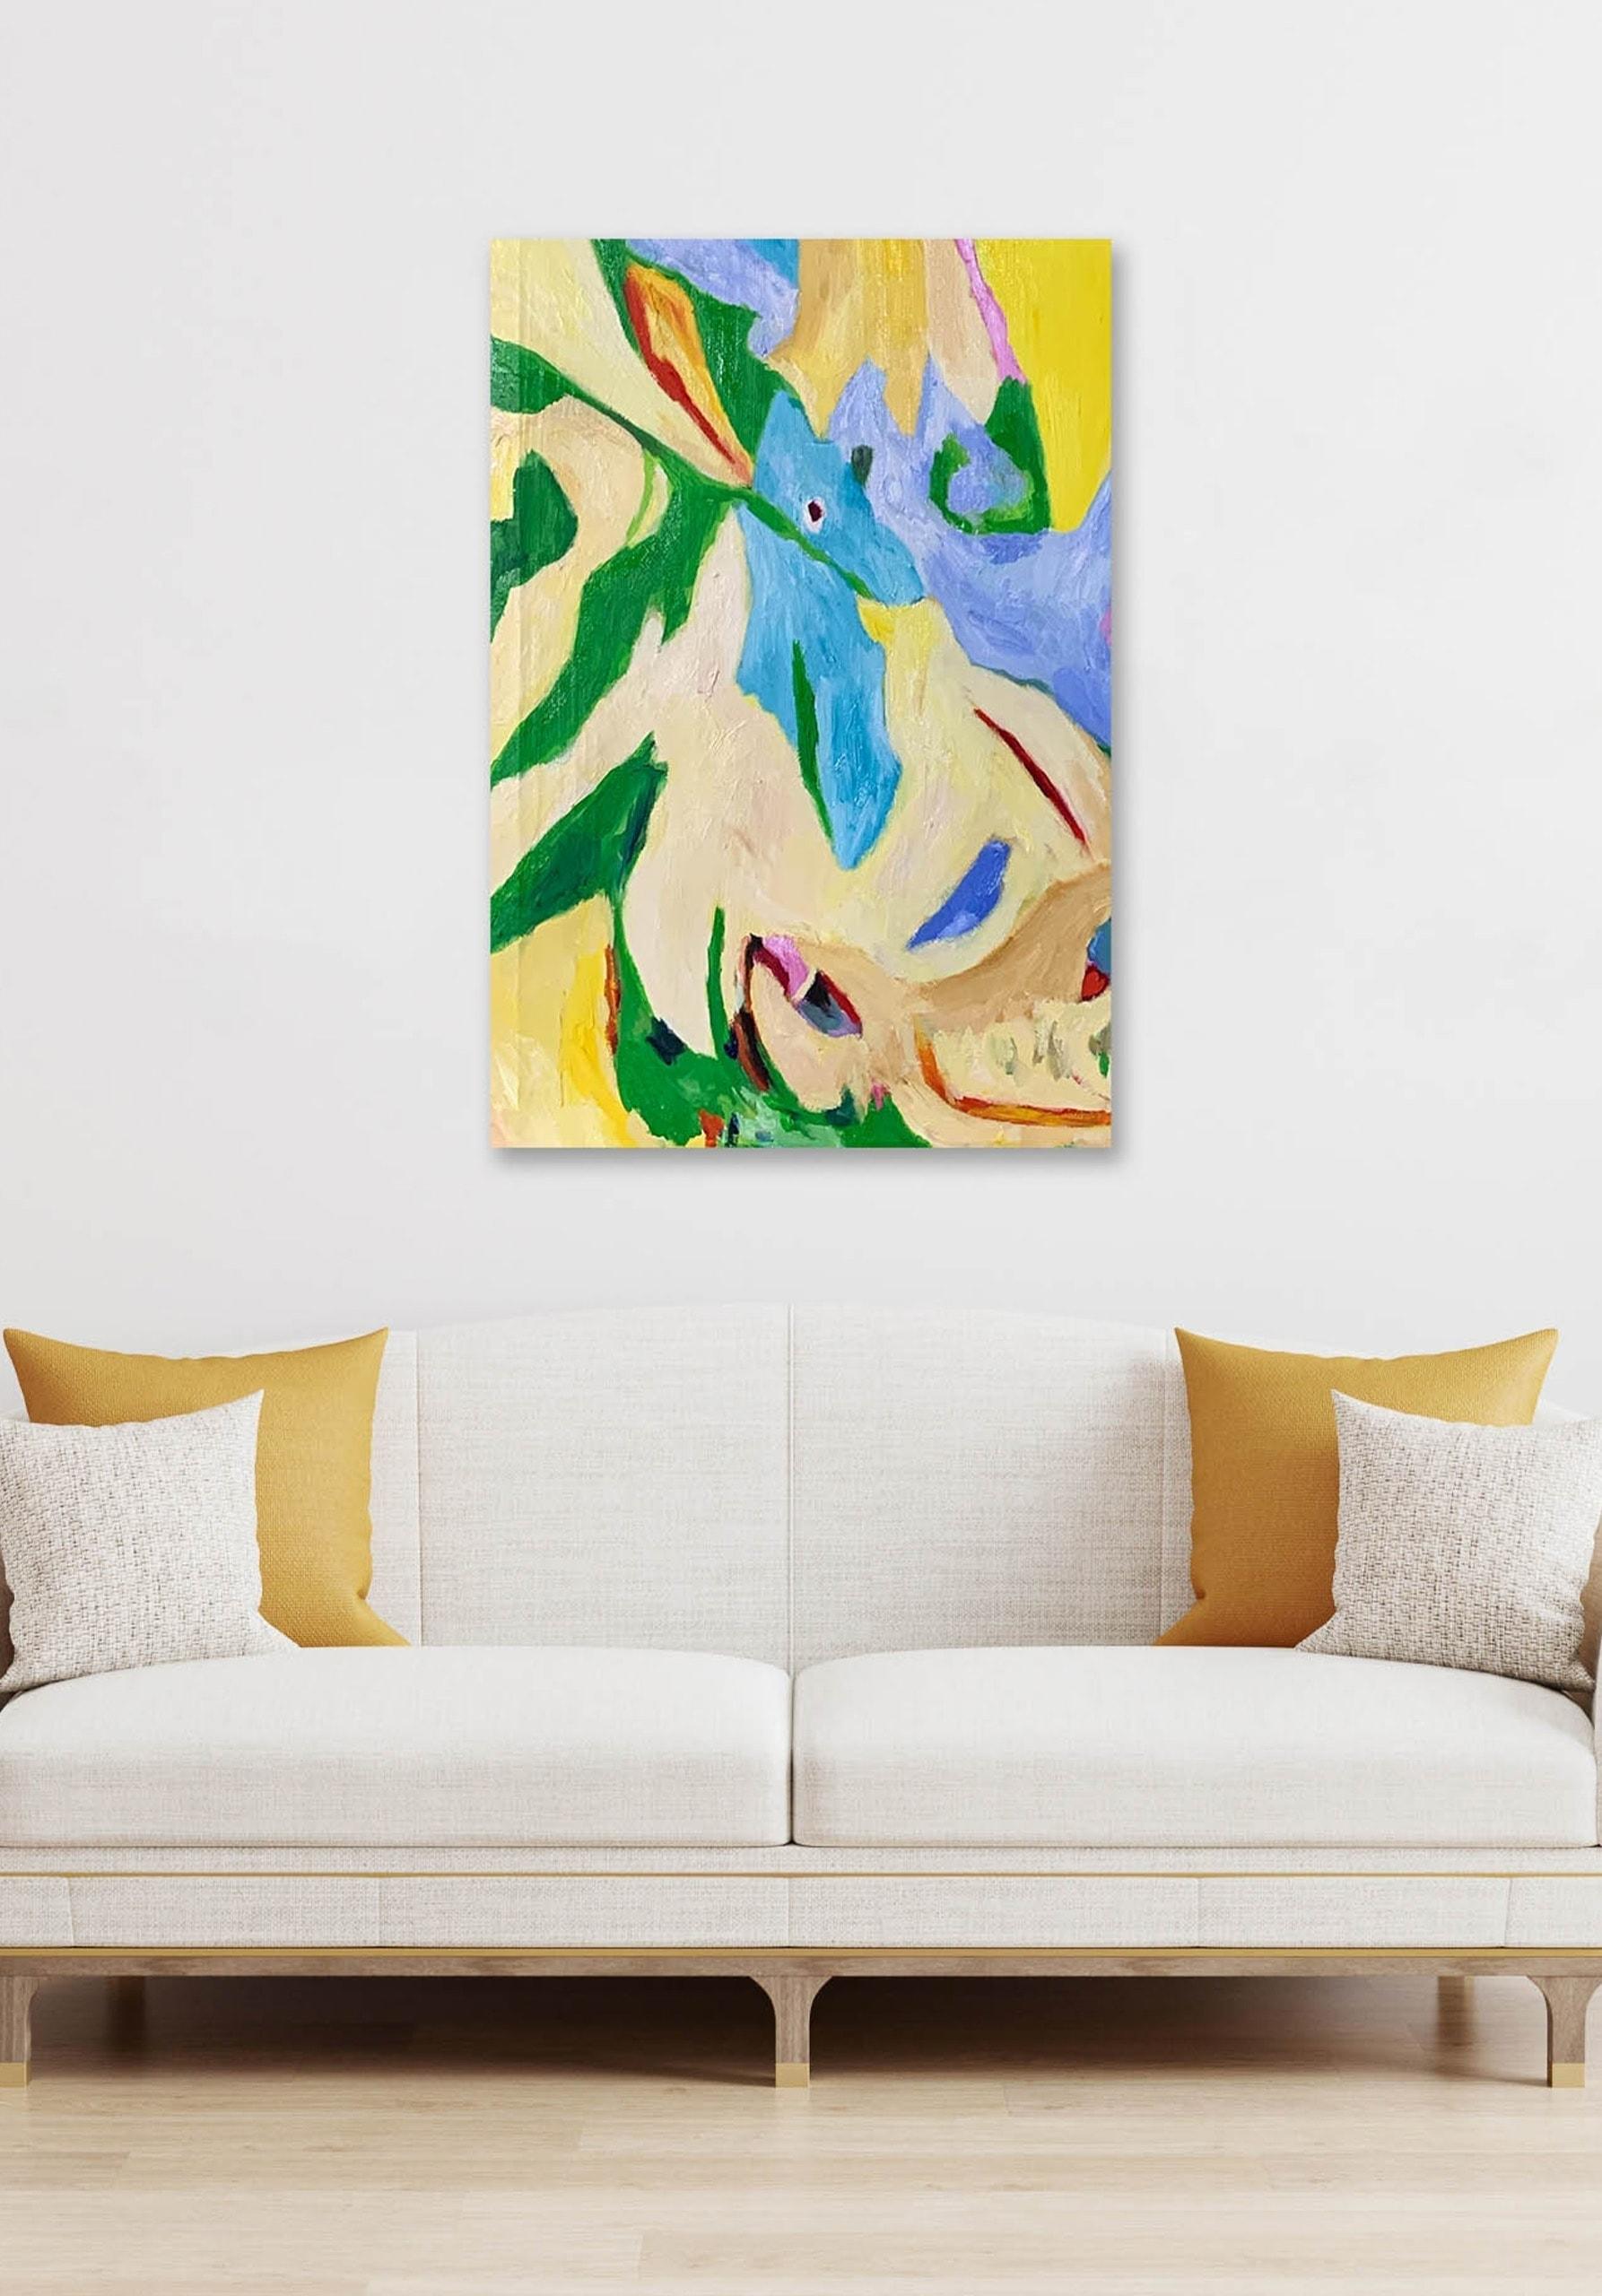 Abstract paintings expressiv wall art